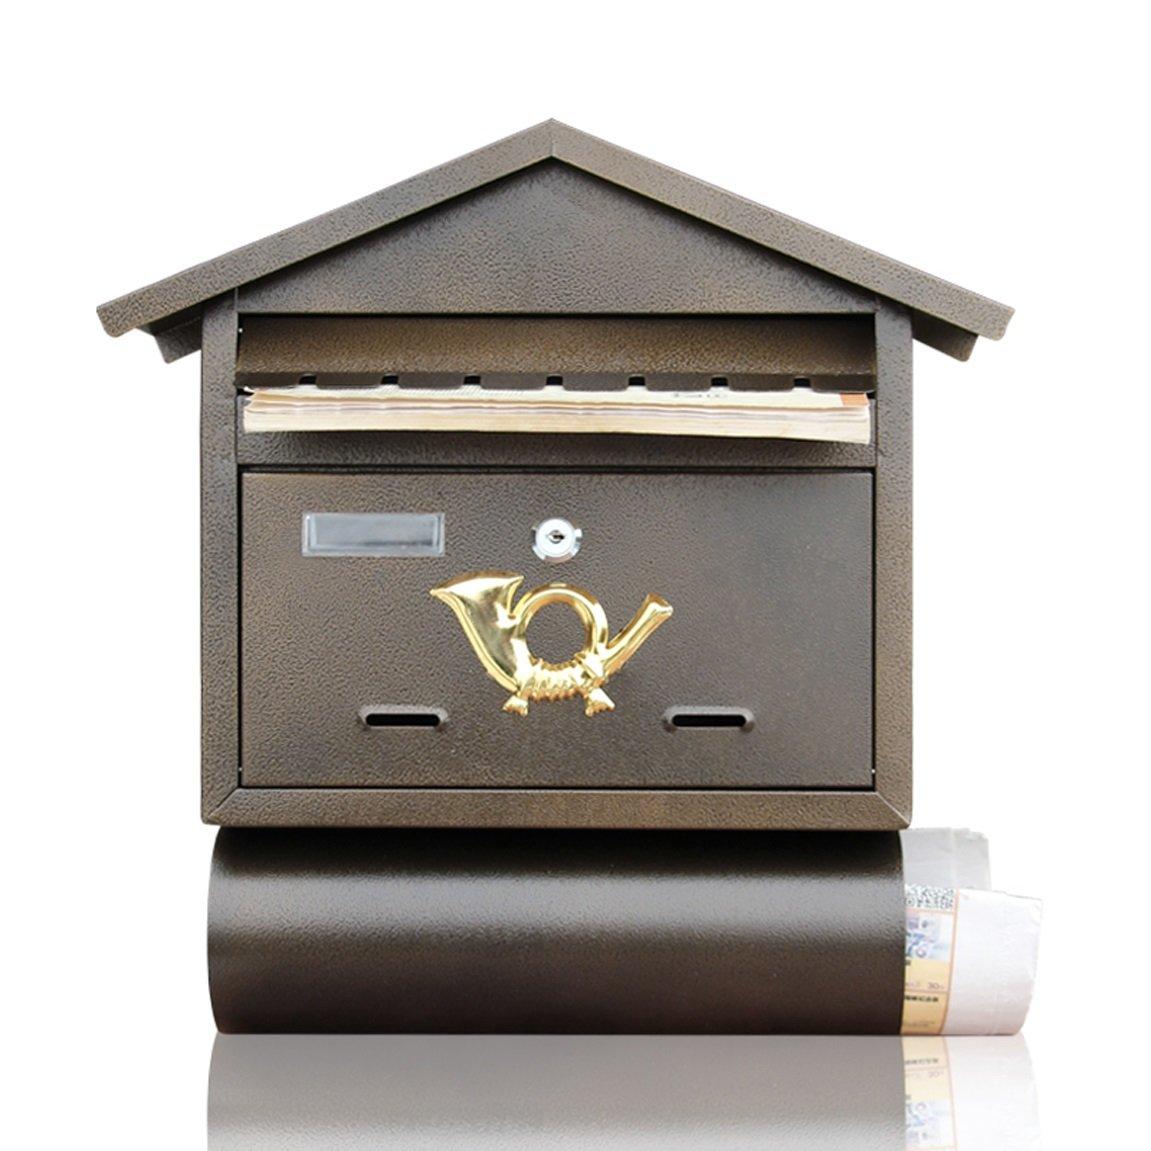 Mzl Madera Maciza Europea Villa buz/ón de Madera Caja de Documentos Impermeable al Aire Libre montado en la Pared con Llave